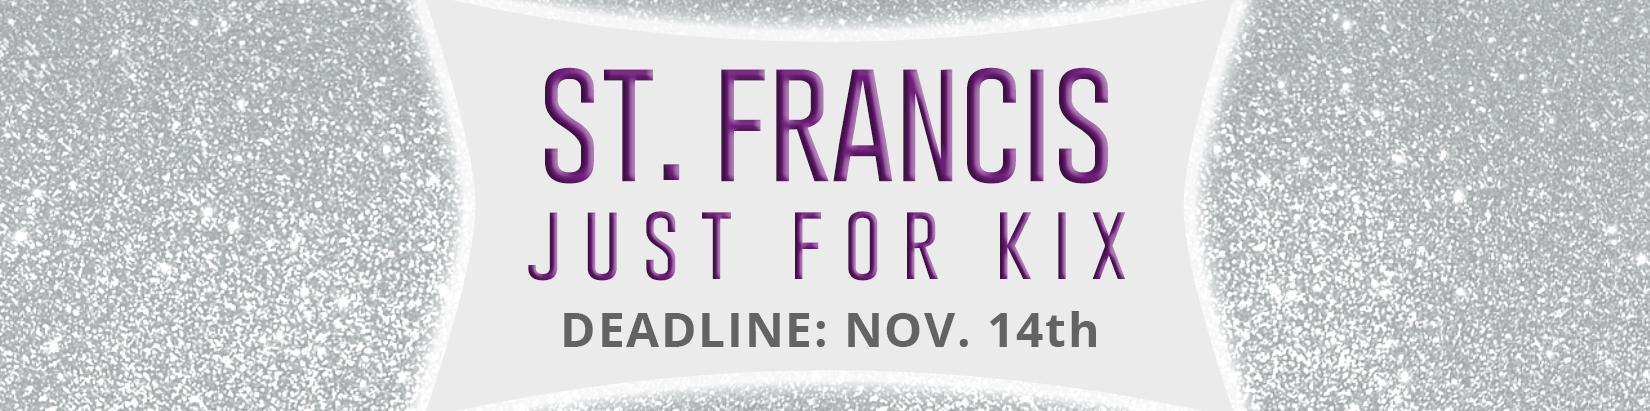 St. Francis Just For Kix